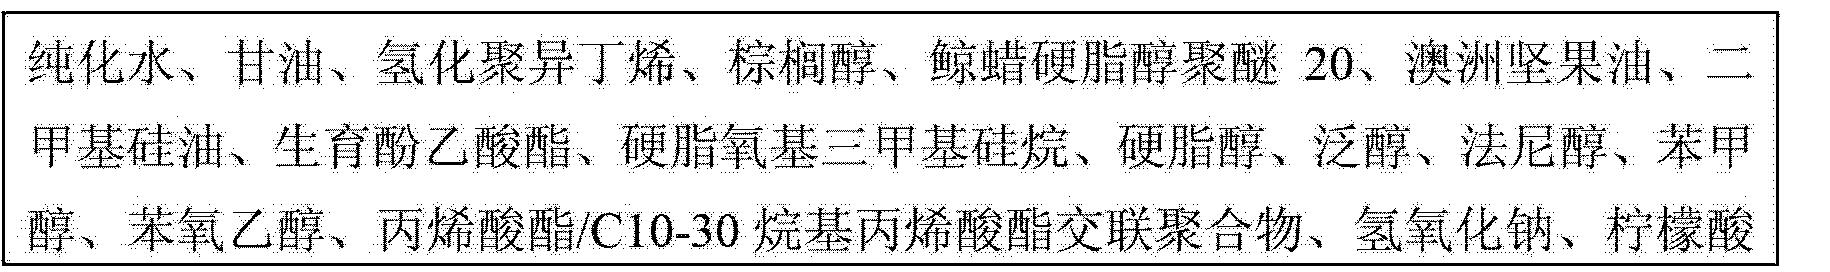 Figure CN102711743AD00472